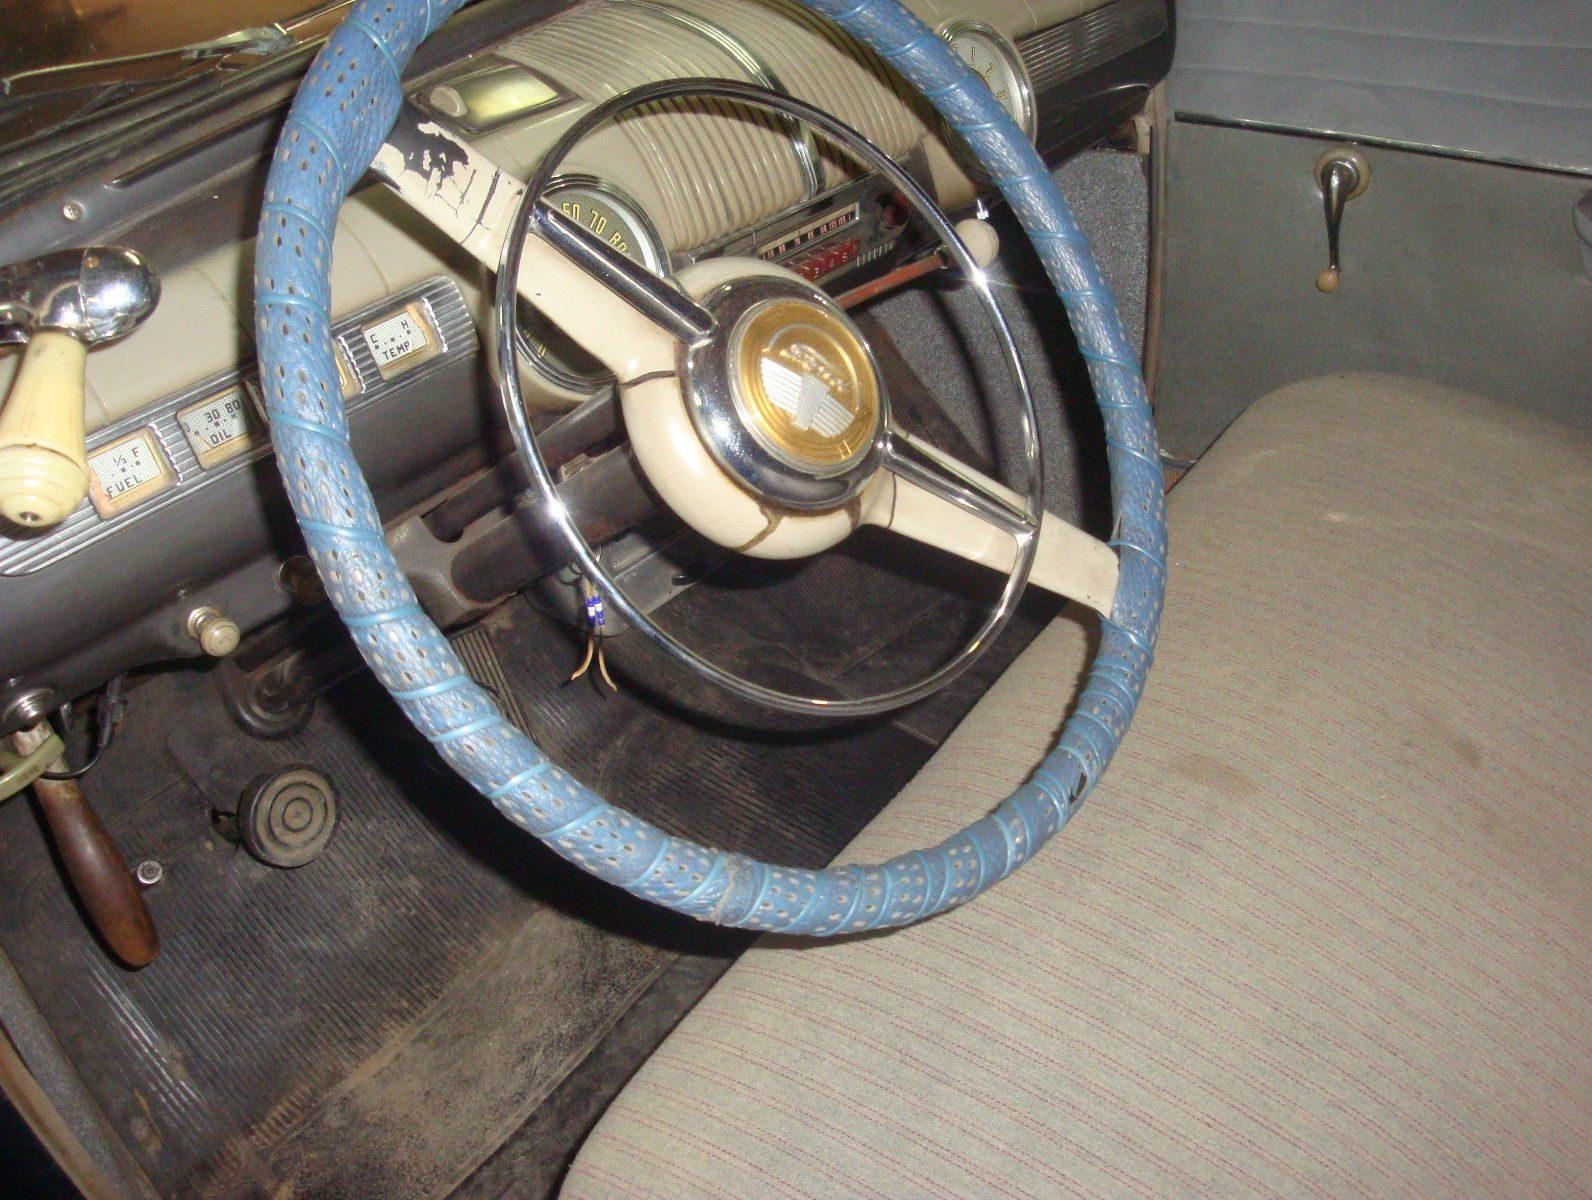 Prewar Style: 1948 Ford Super Deluxe